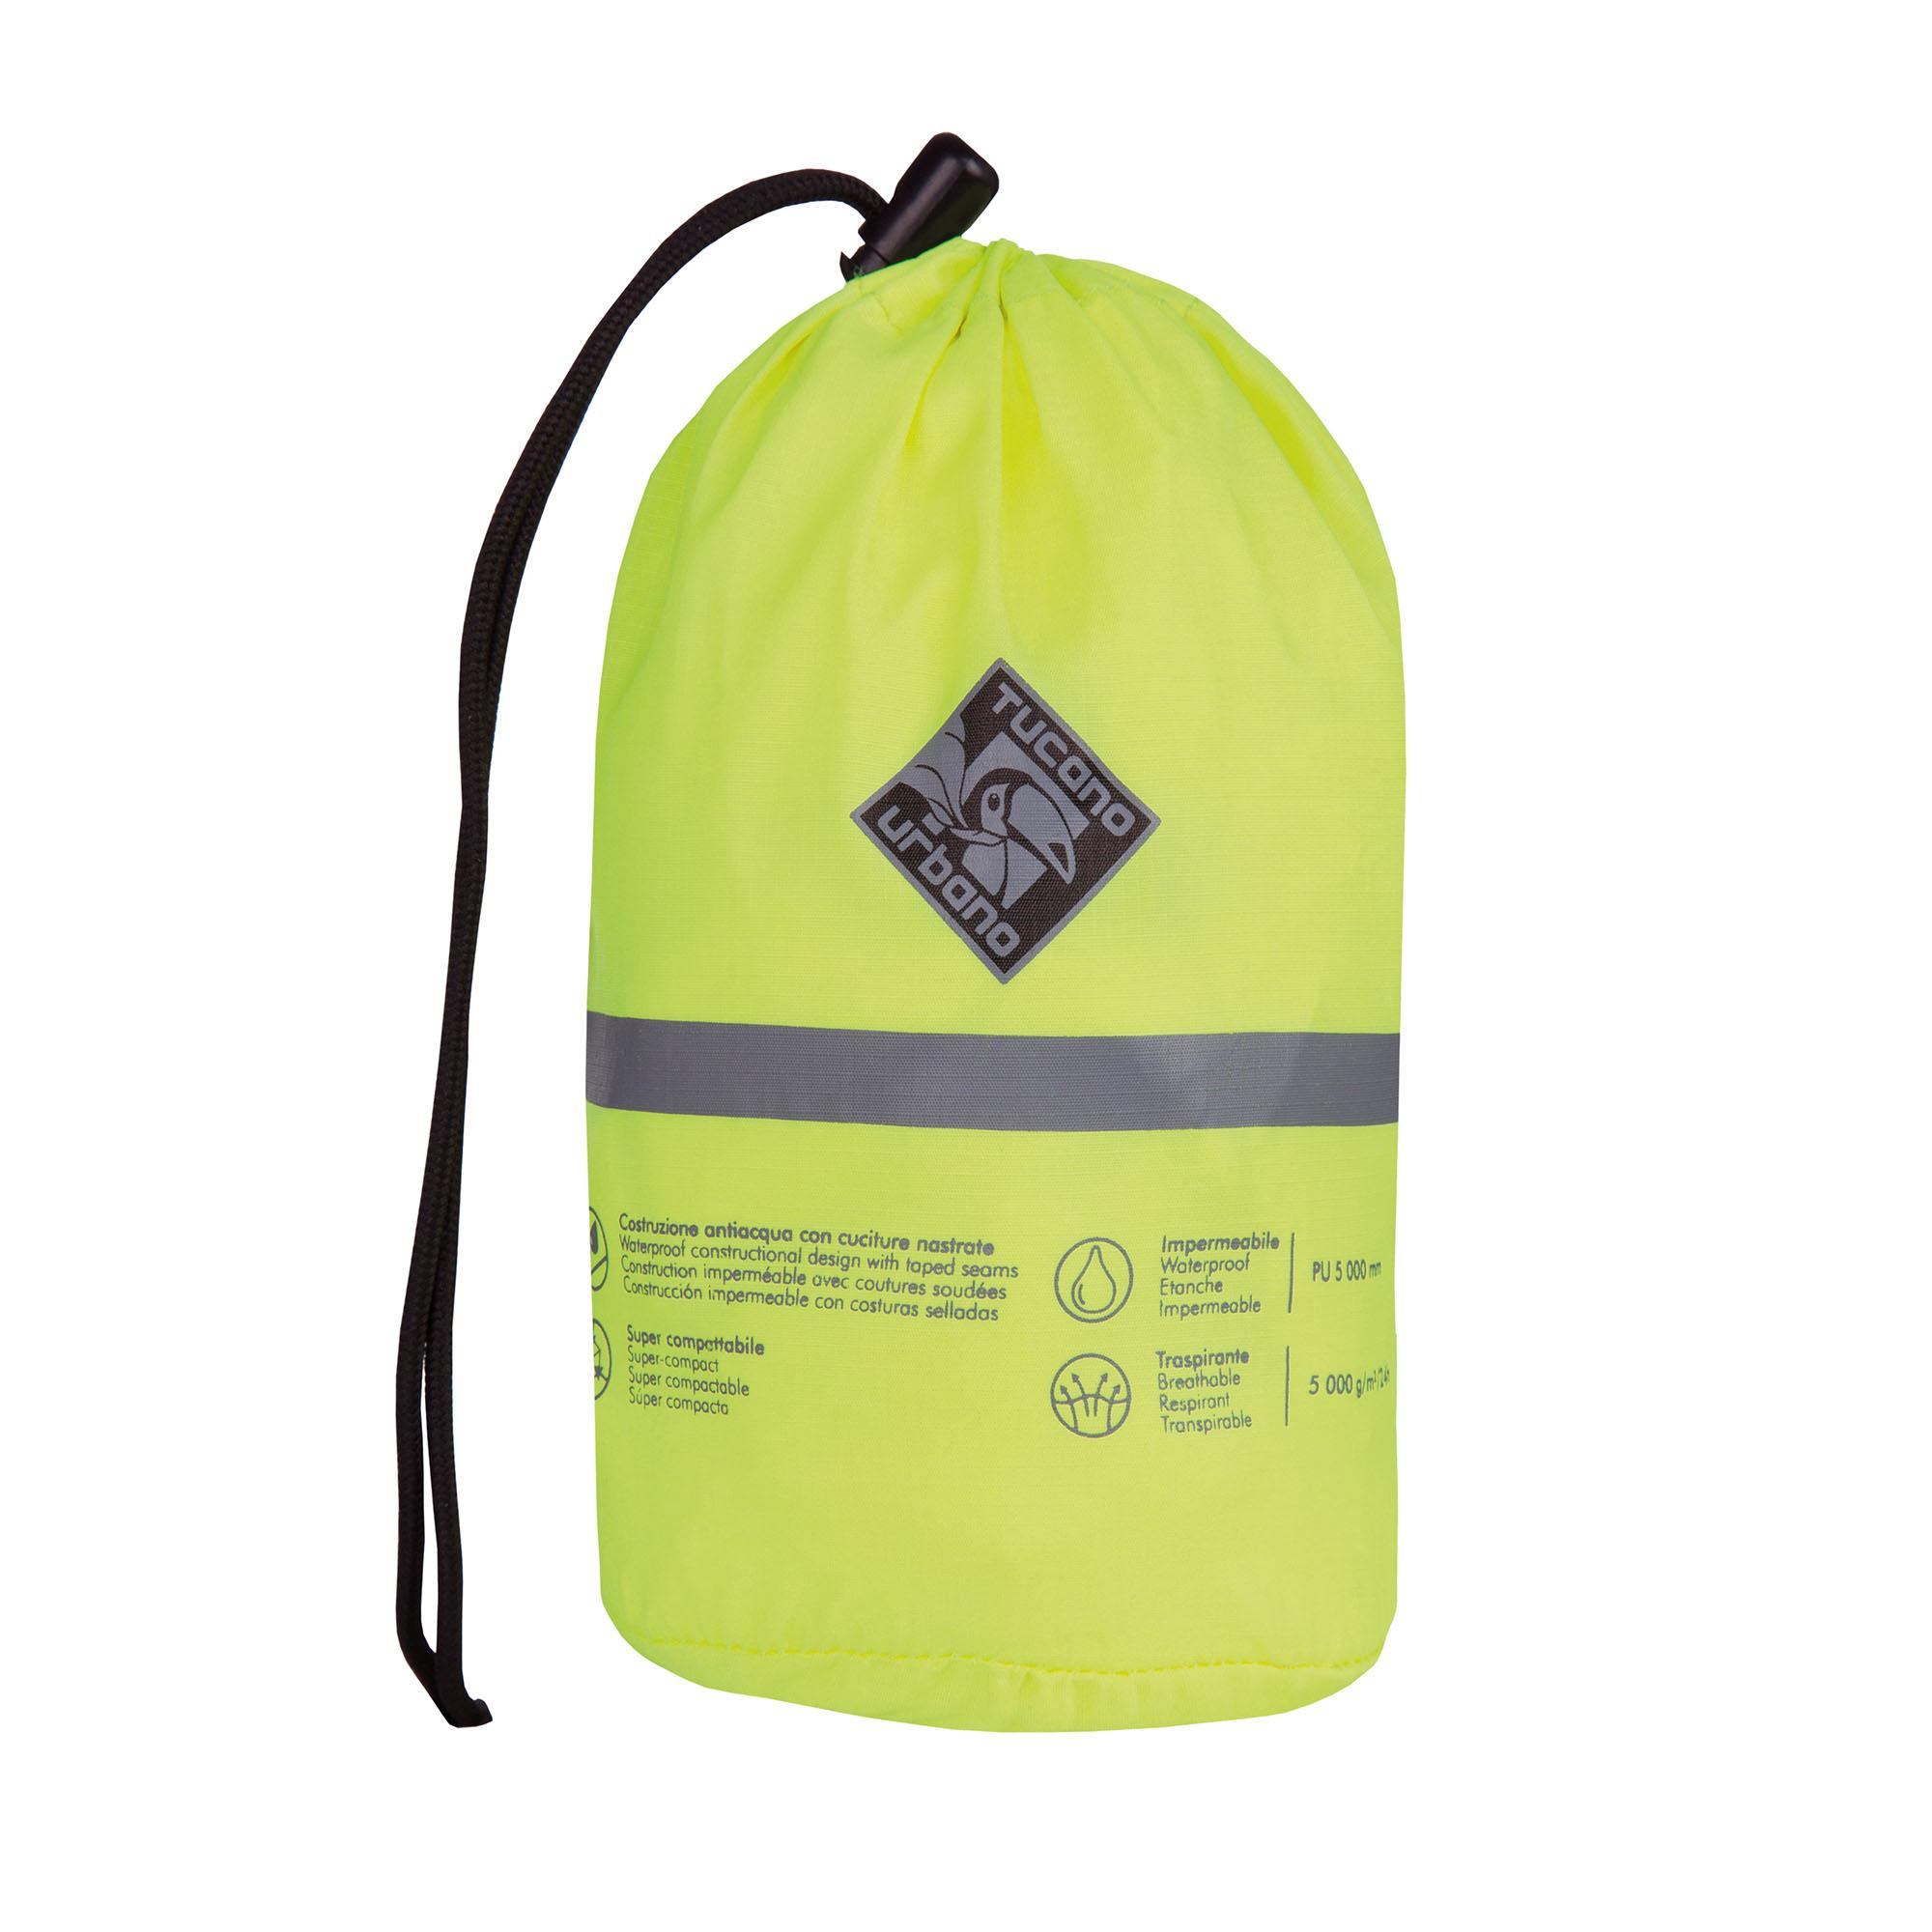 Super–compact Raincoat Nano Rain Jacket Plus Fluorescent Yellow